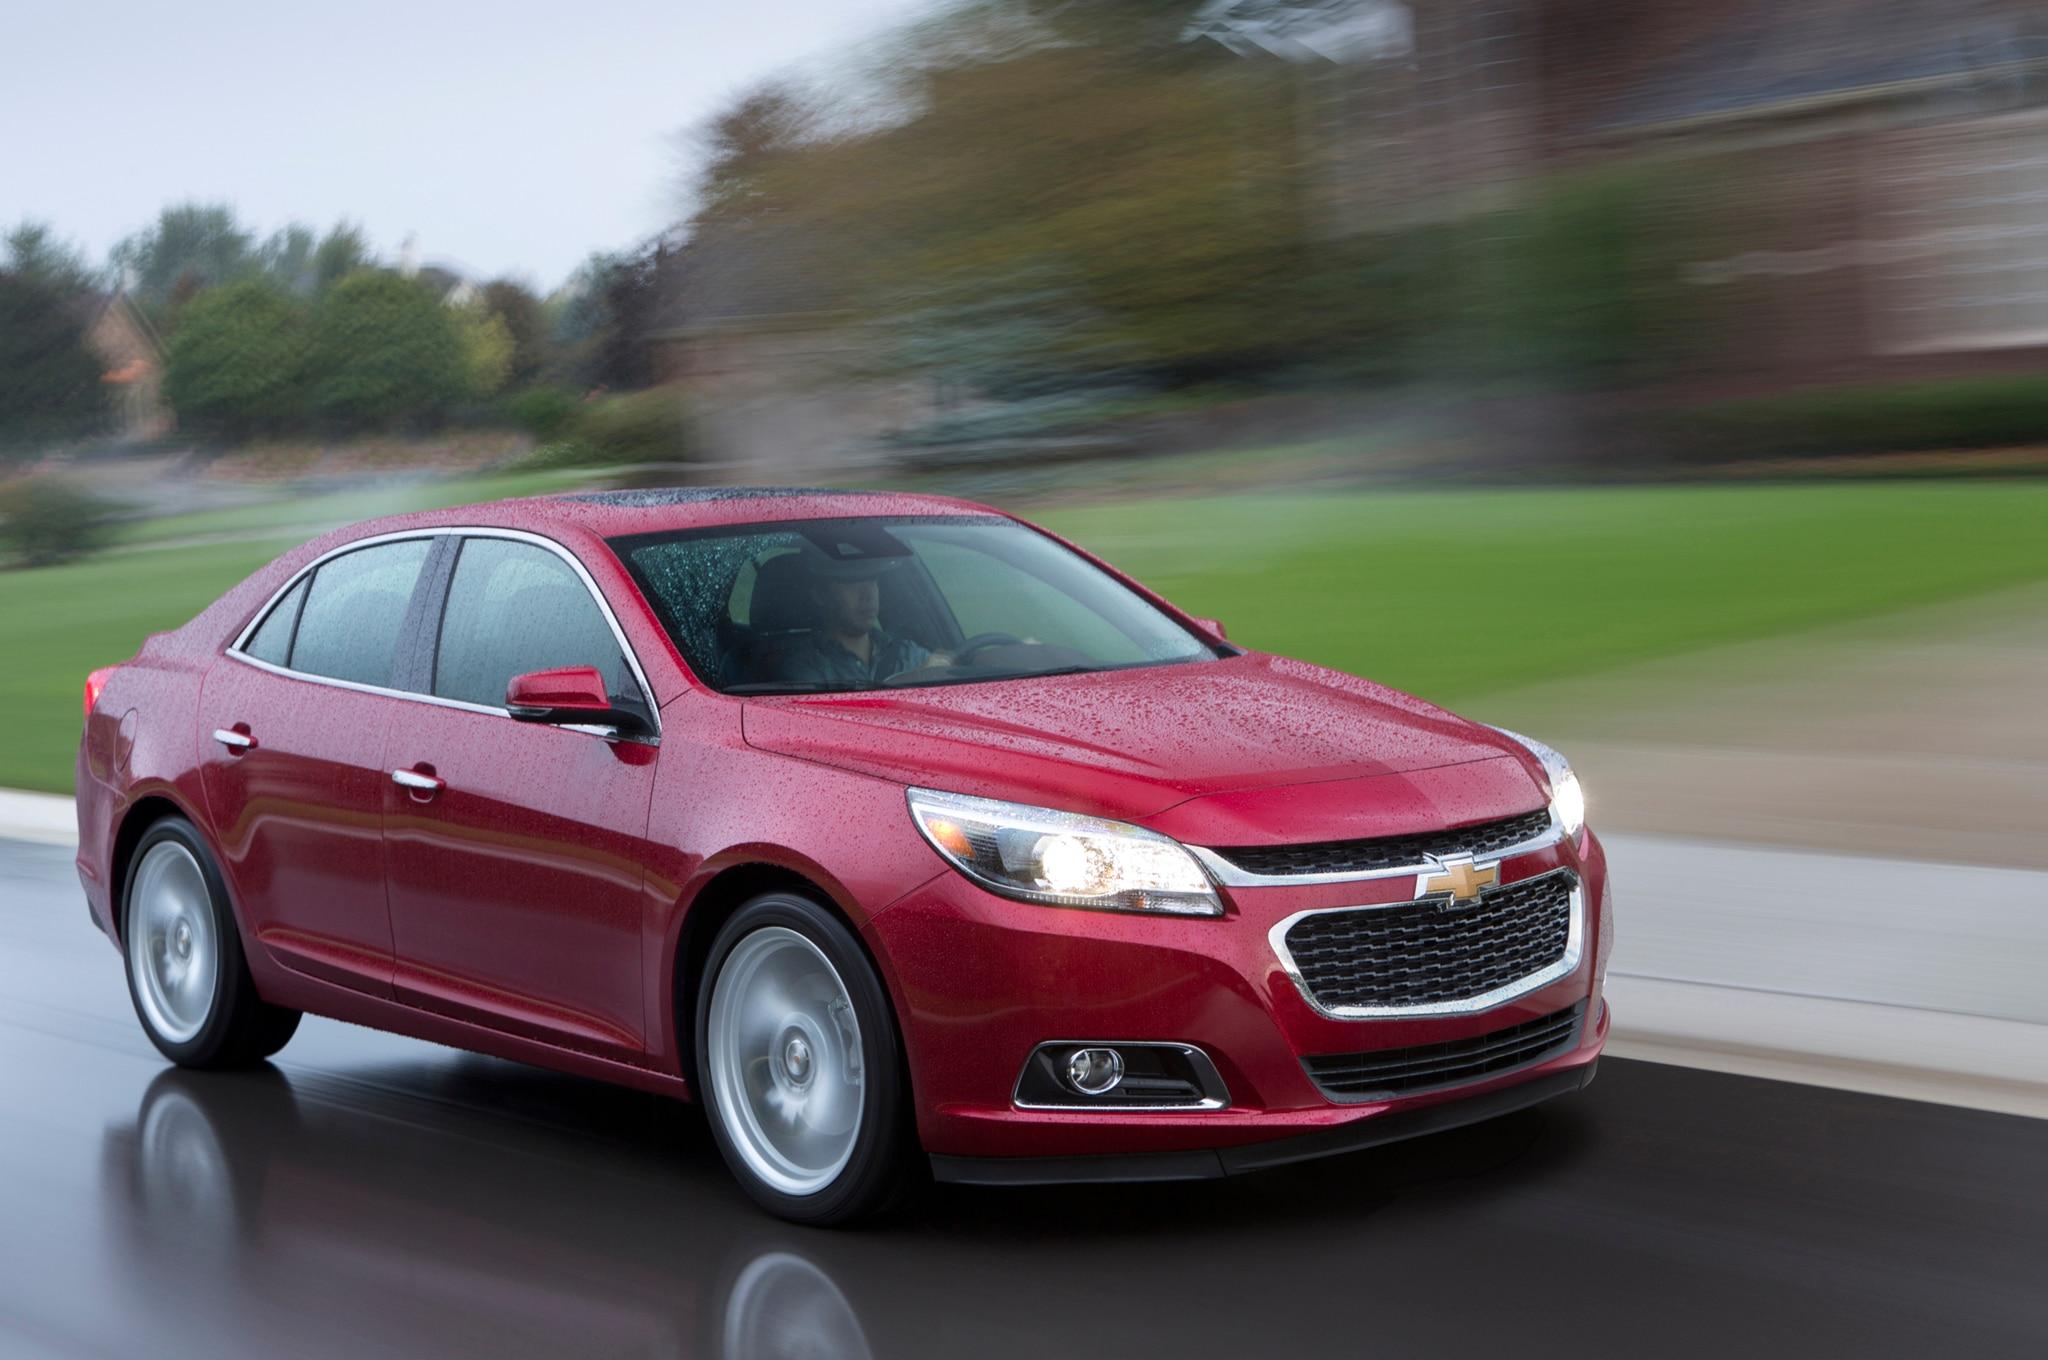 2014 Chevrolet Malibu Front Three Quarter Motion1